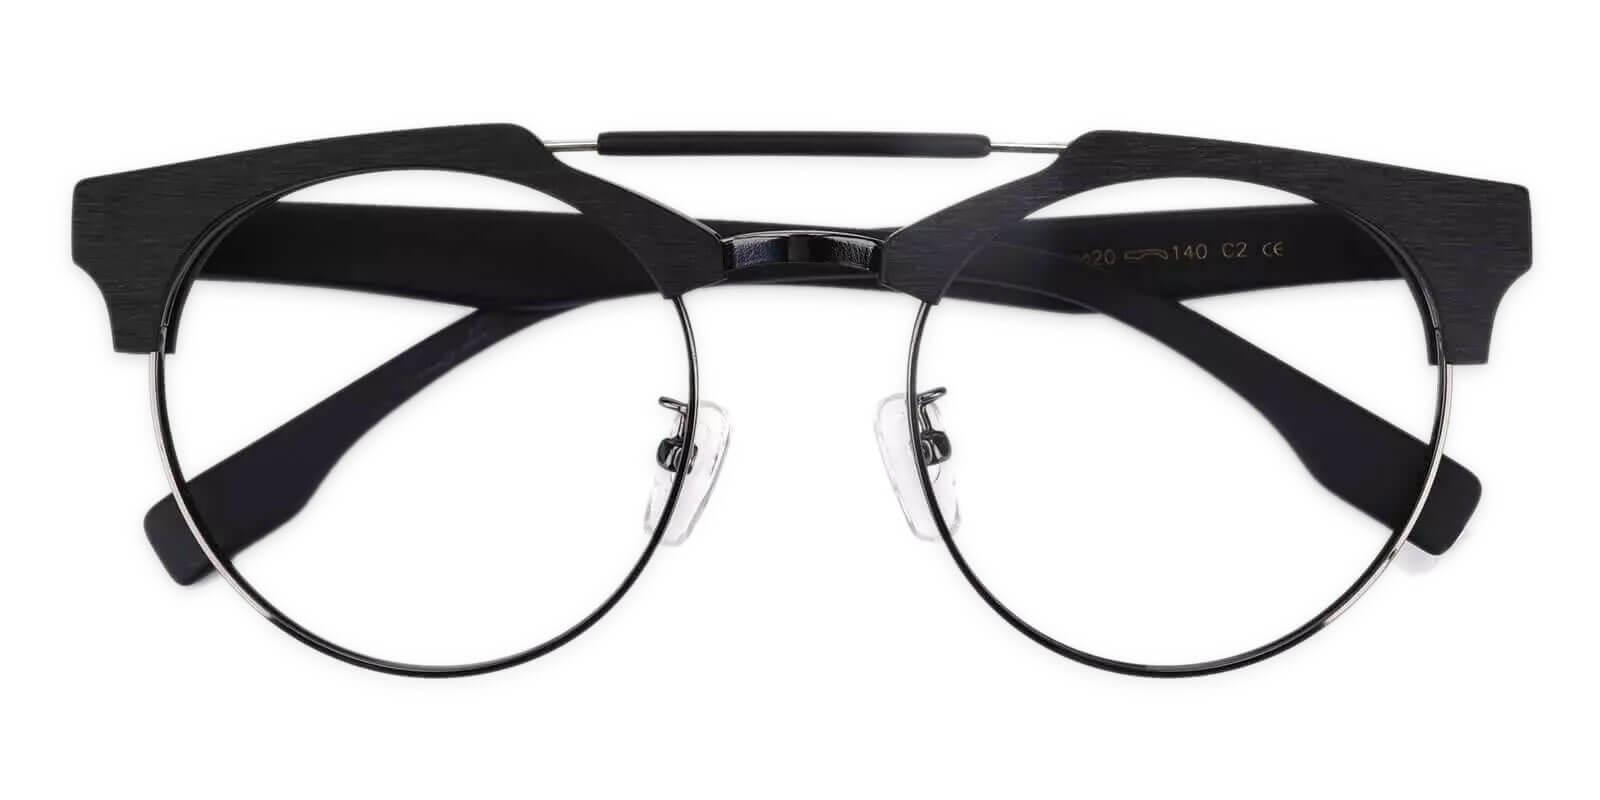 Orbisonia Black Combination Eyeglasses , NosePads Frames from ABBE Glasses